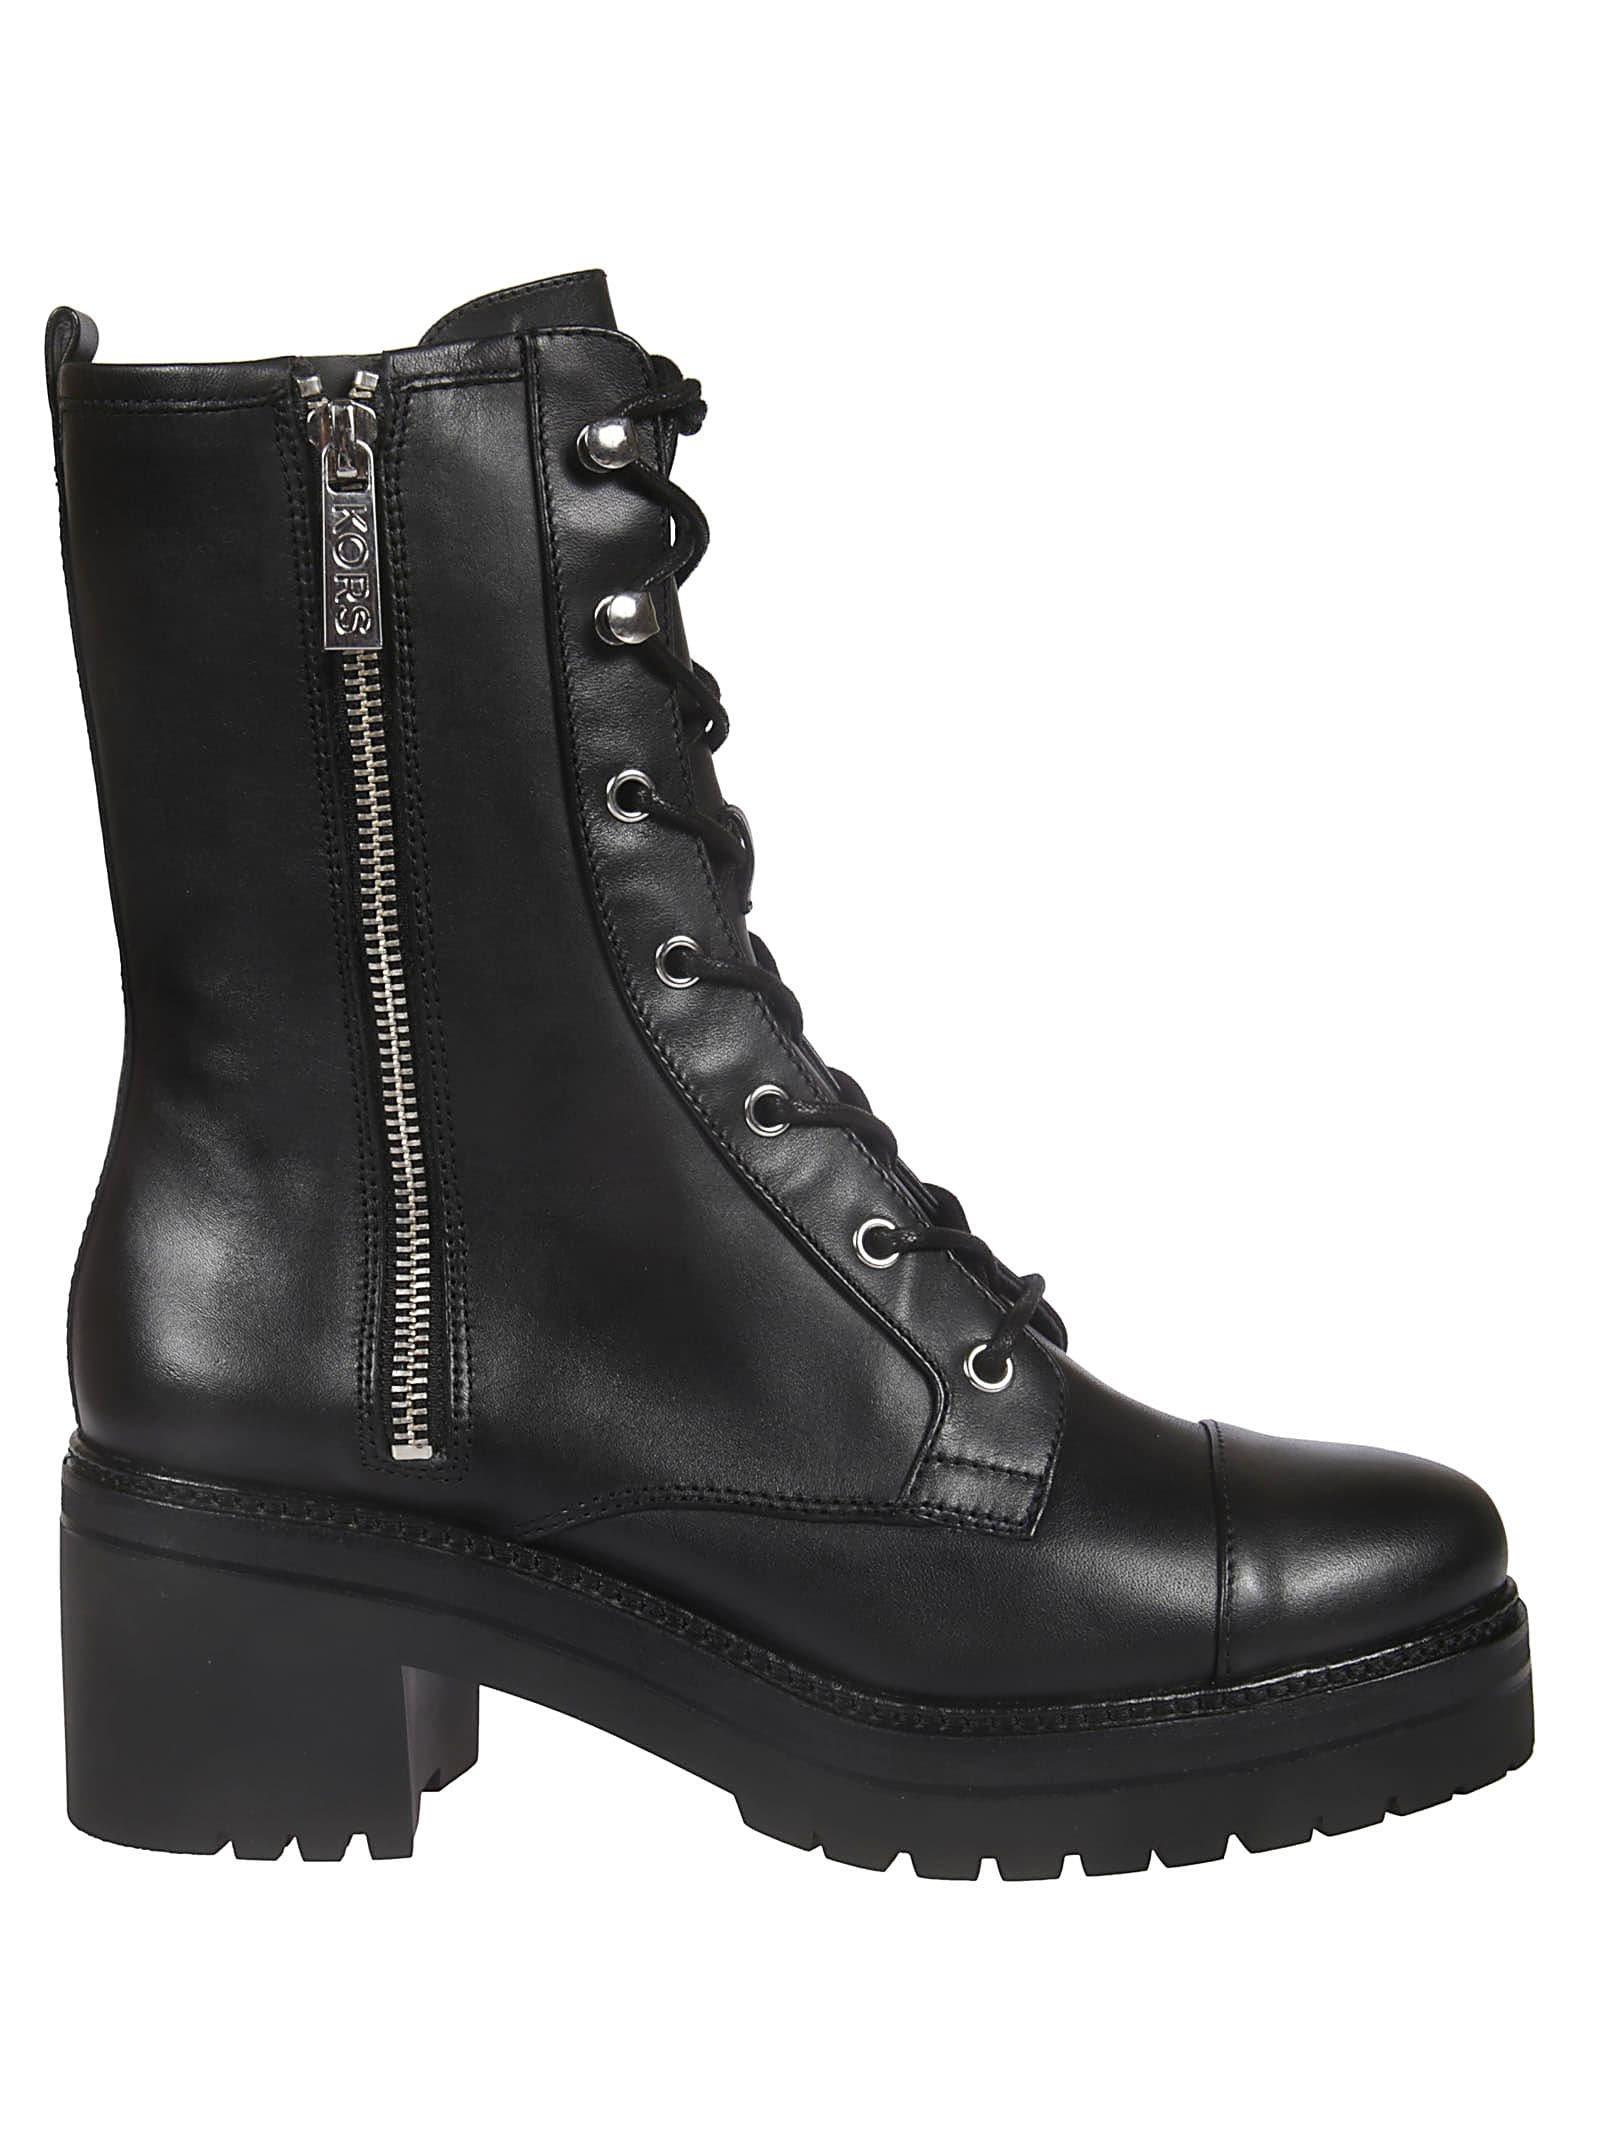 Michael Kors Anaka Lace Up Boots